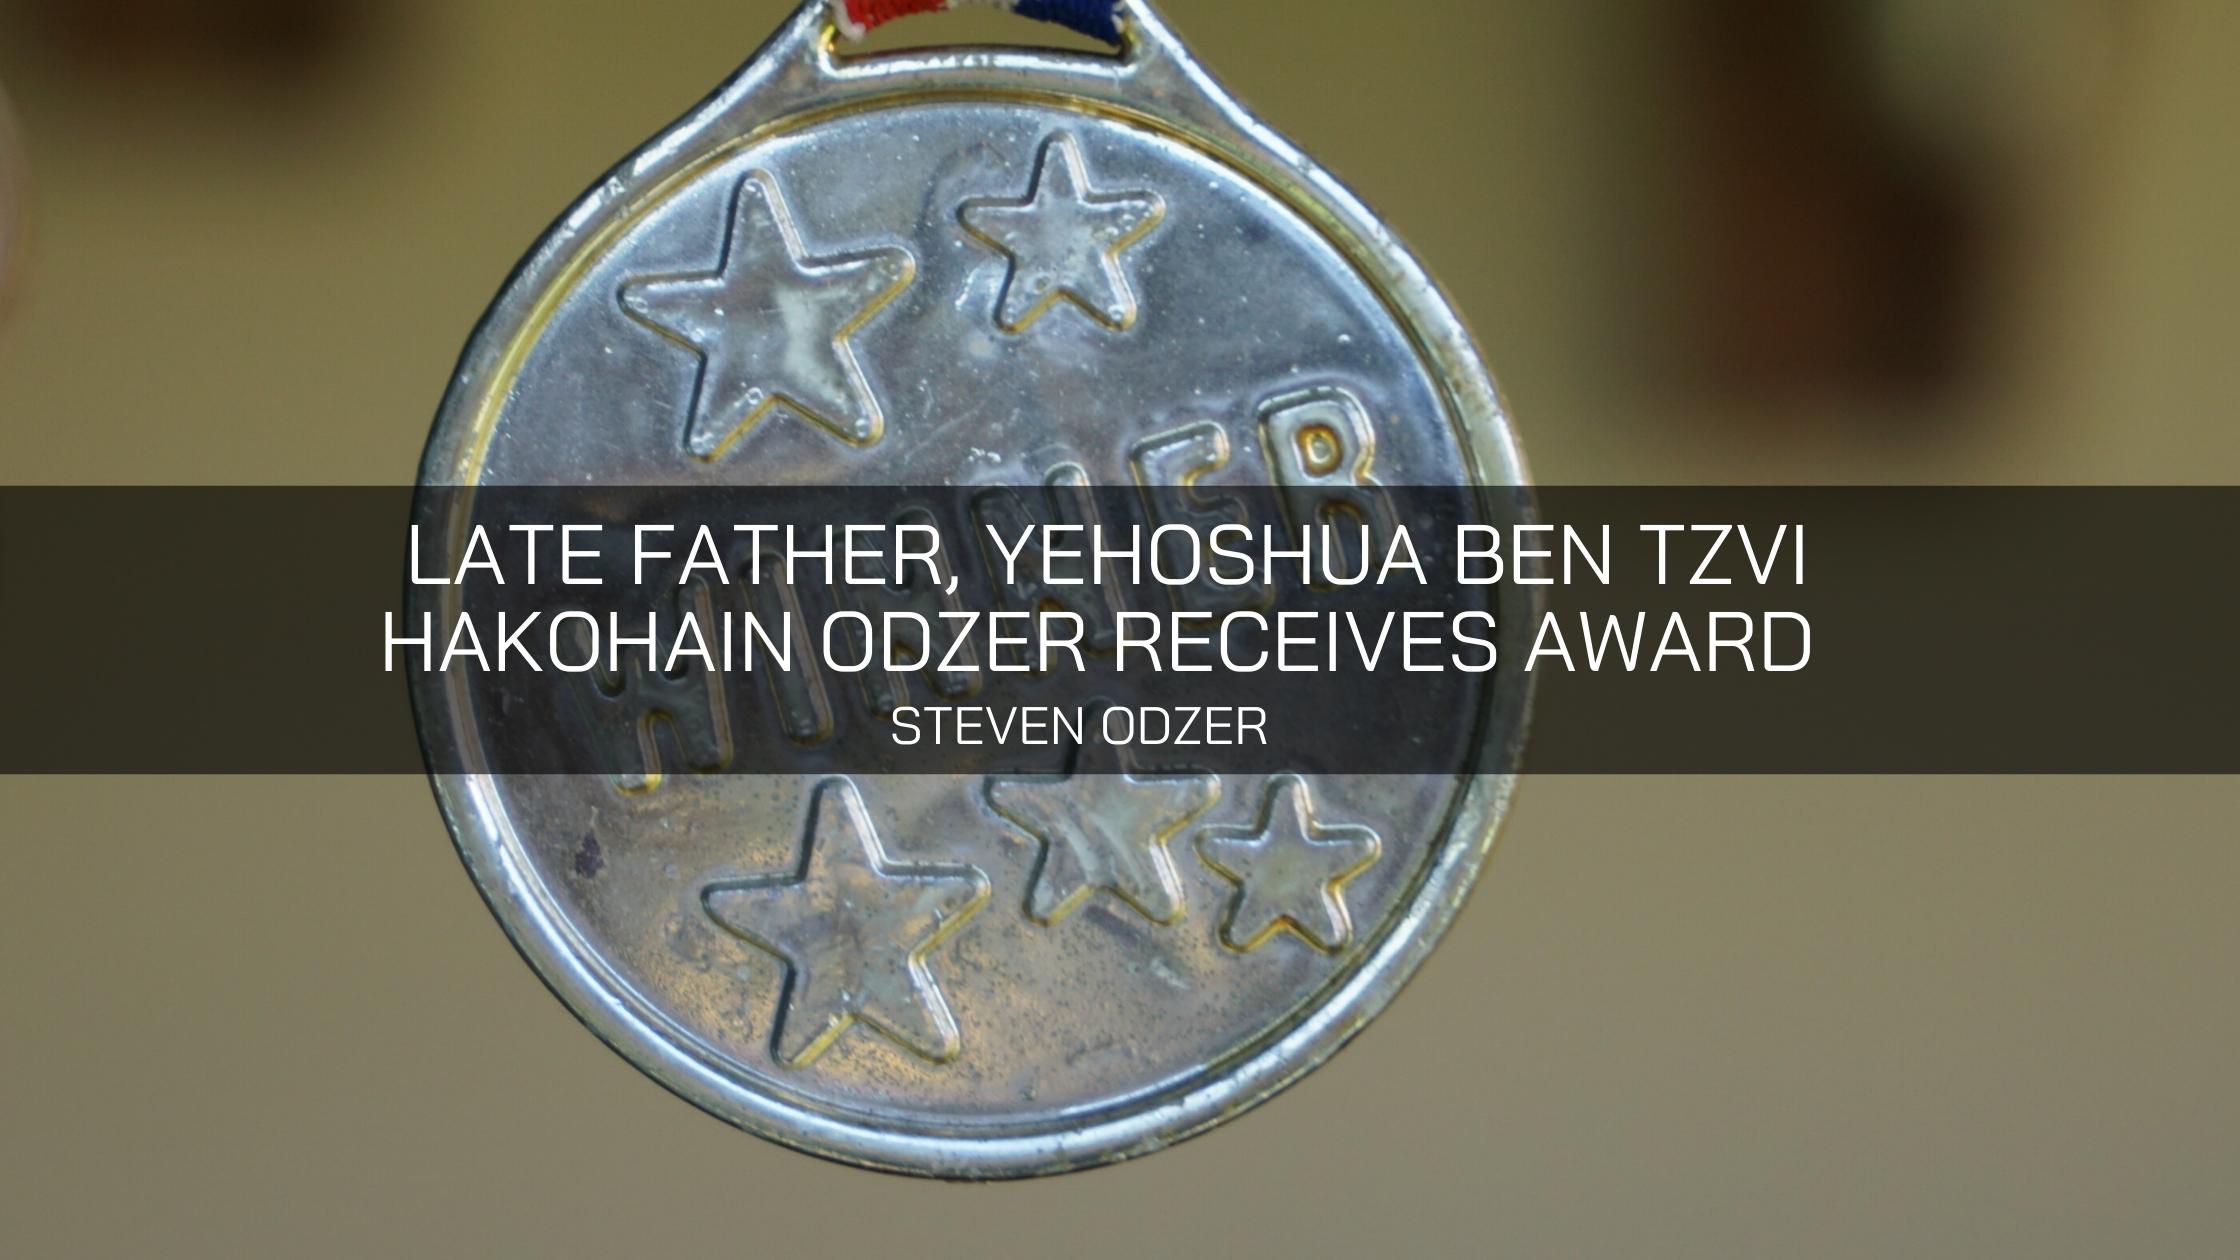 Steven Odzer's Late Father, Yehoshua Ben Tzvi Hakohain Odzer Receives Award